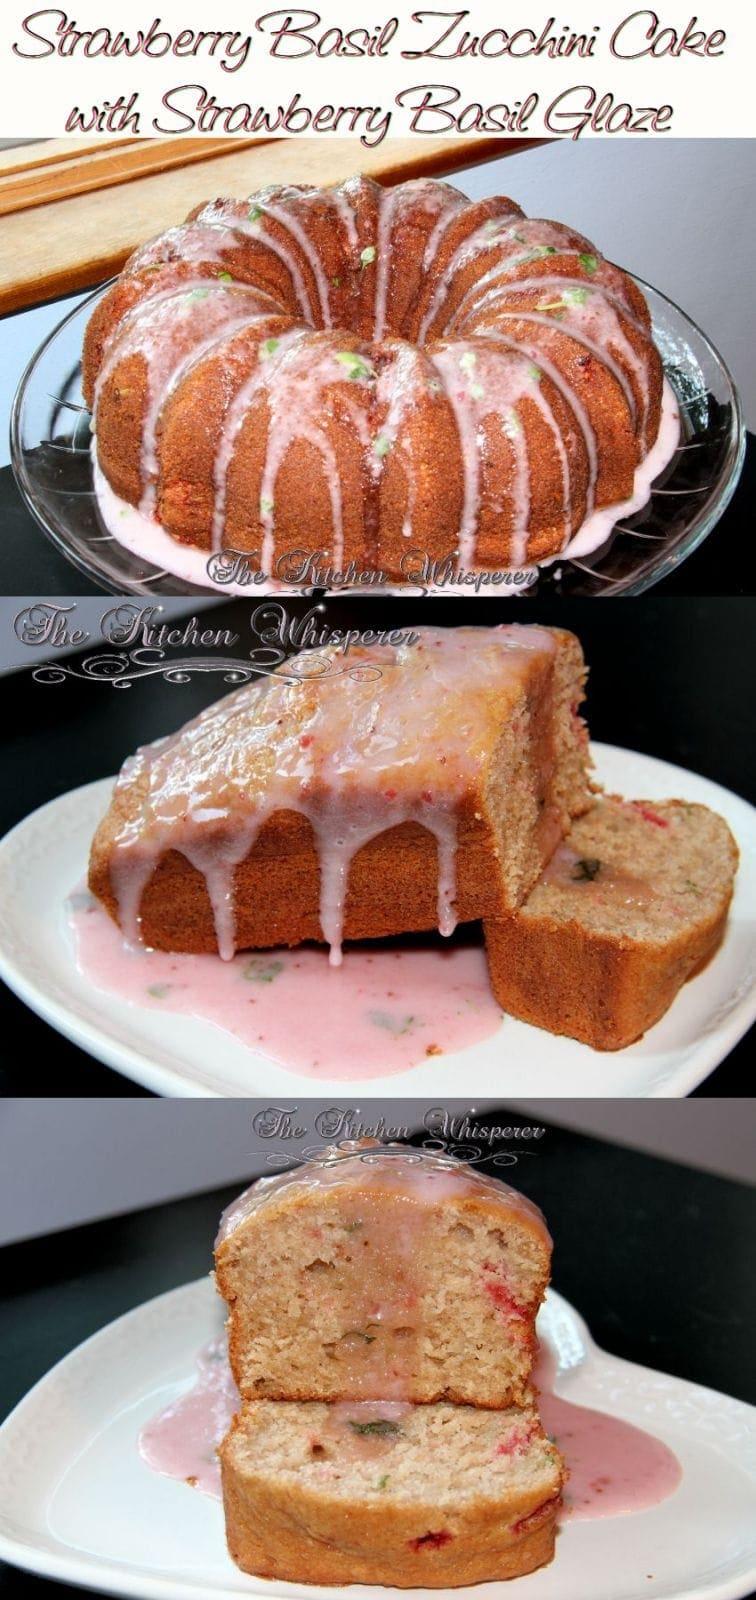 Strawberry Basil Zucchini Cake-collage